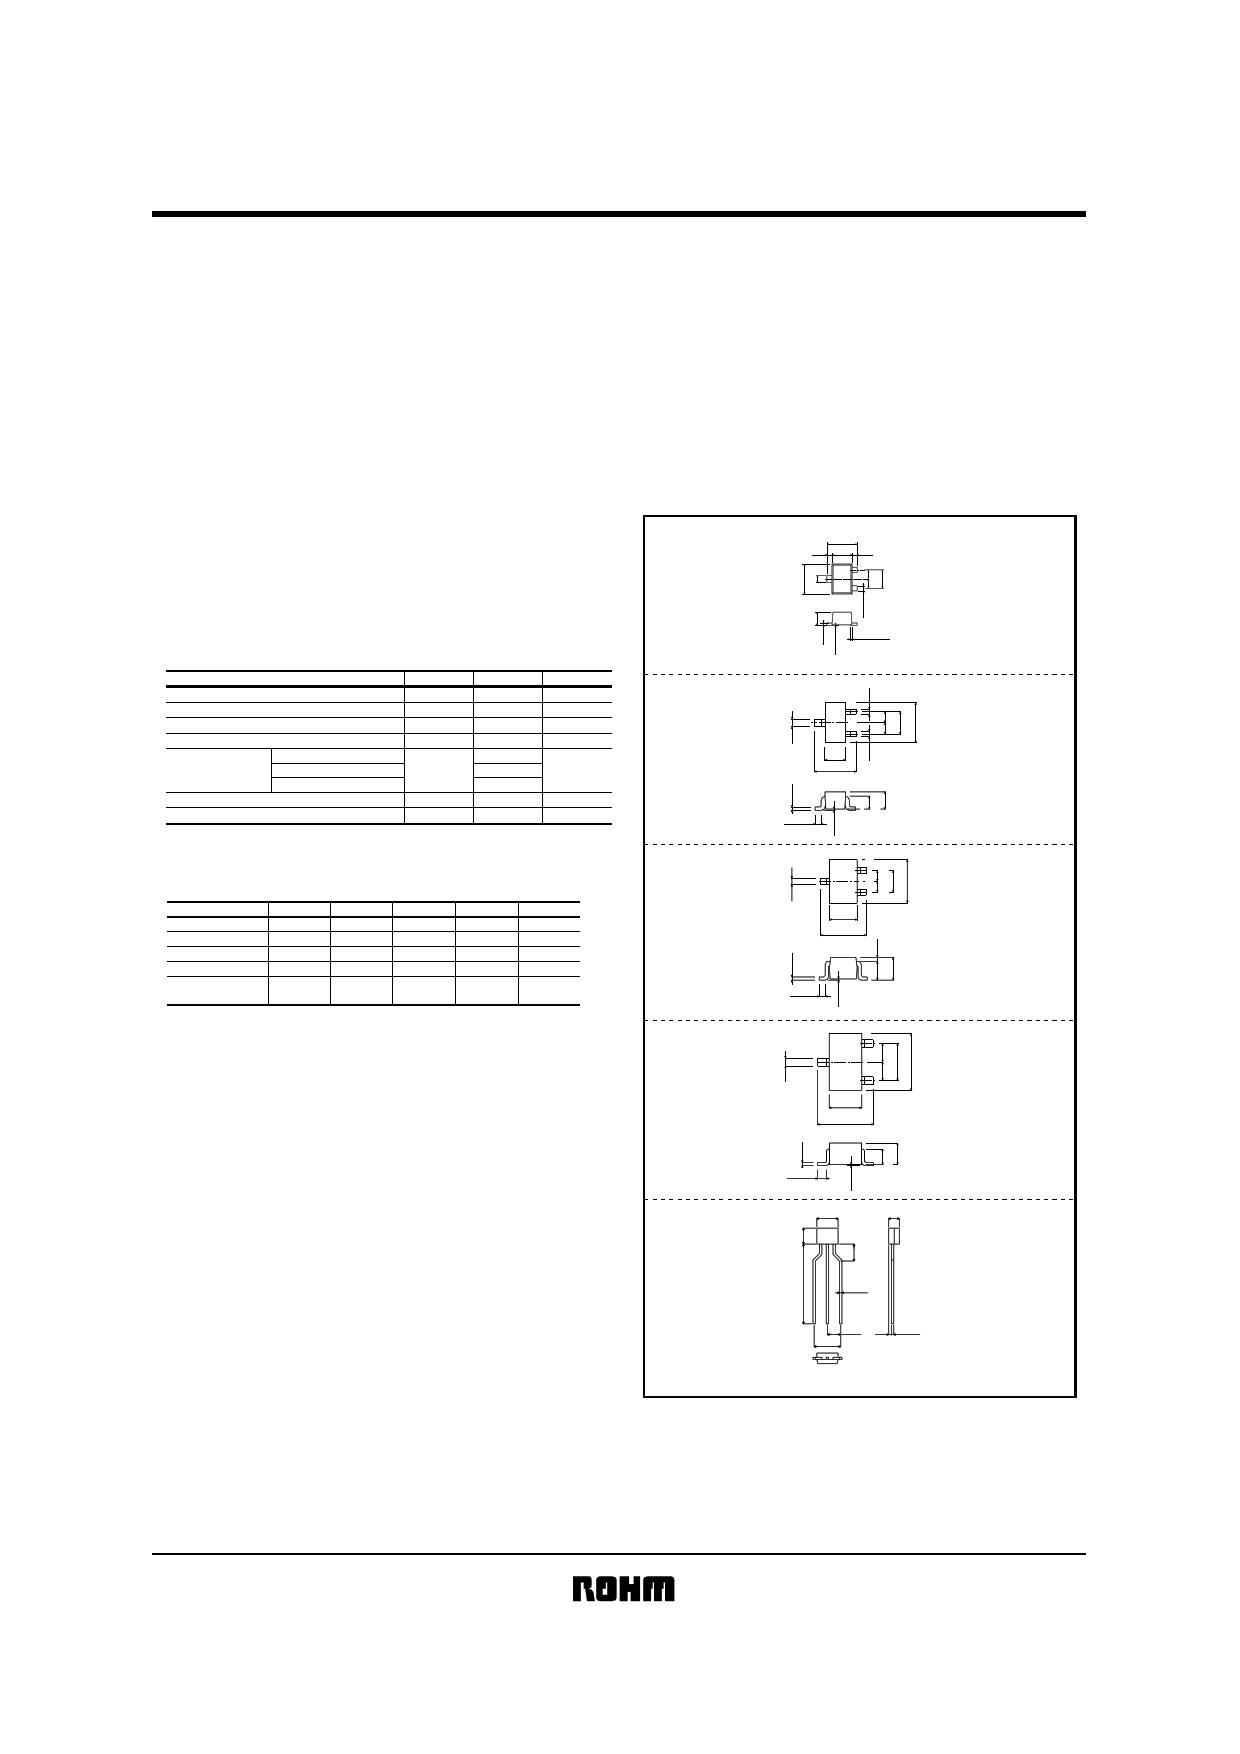 2SC3838 Datasheet, 2SC3838 PDF,ピン配置, 機能